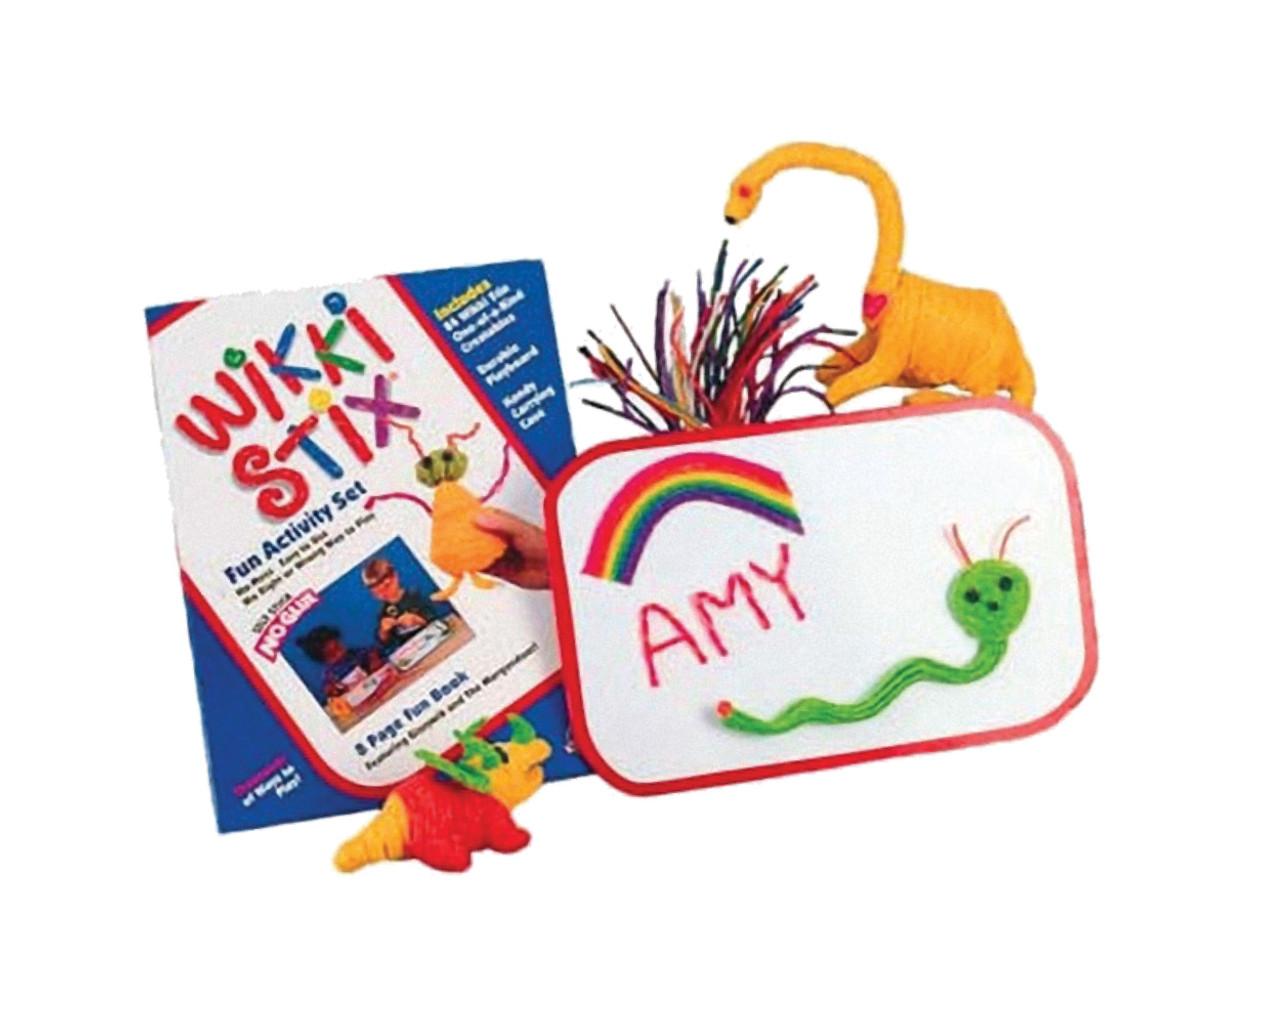 Wikki Stix Fun Activity Set